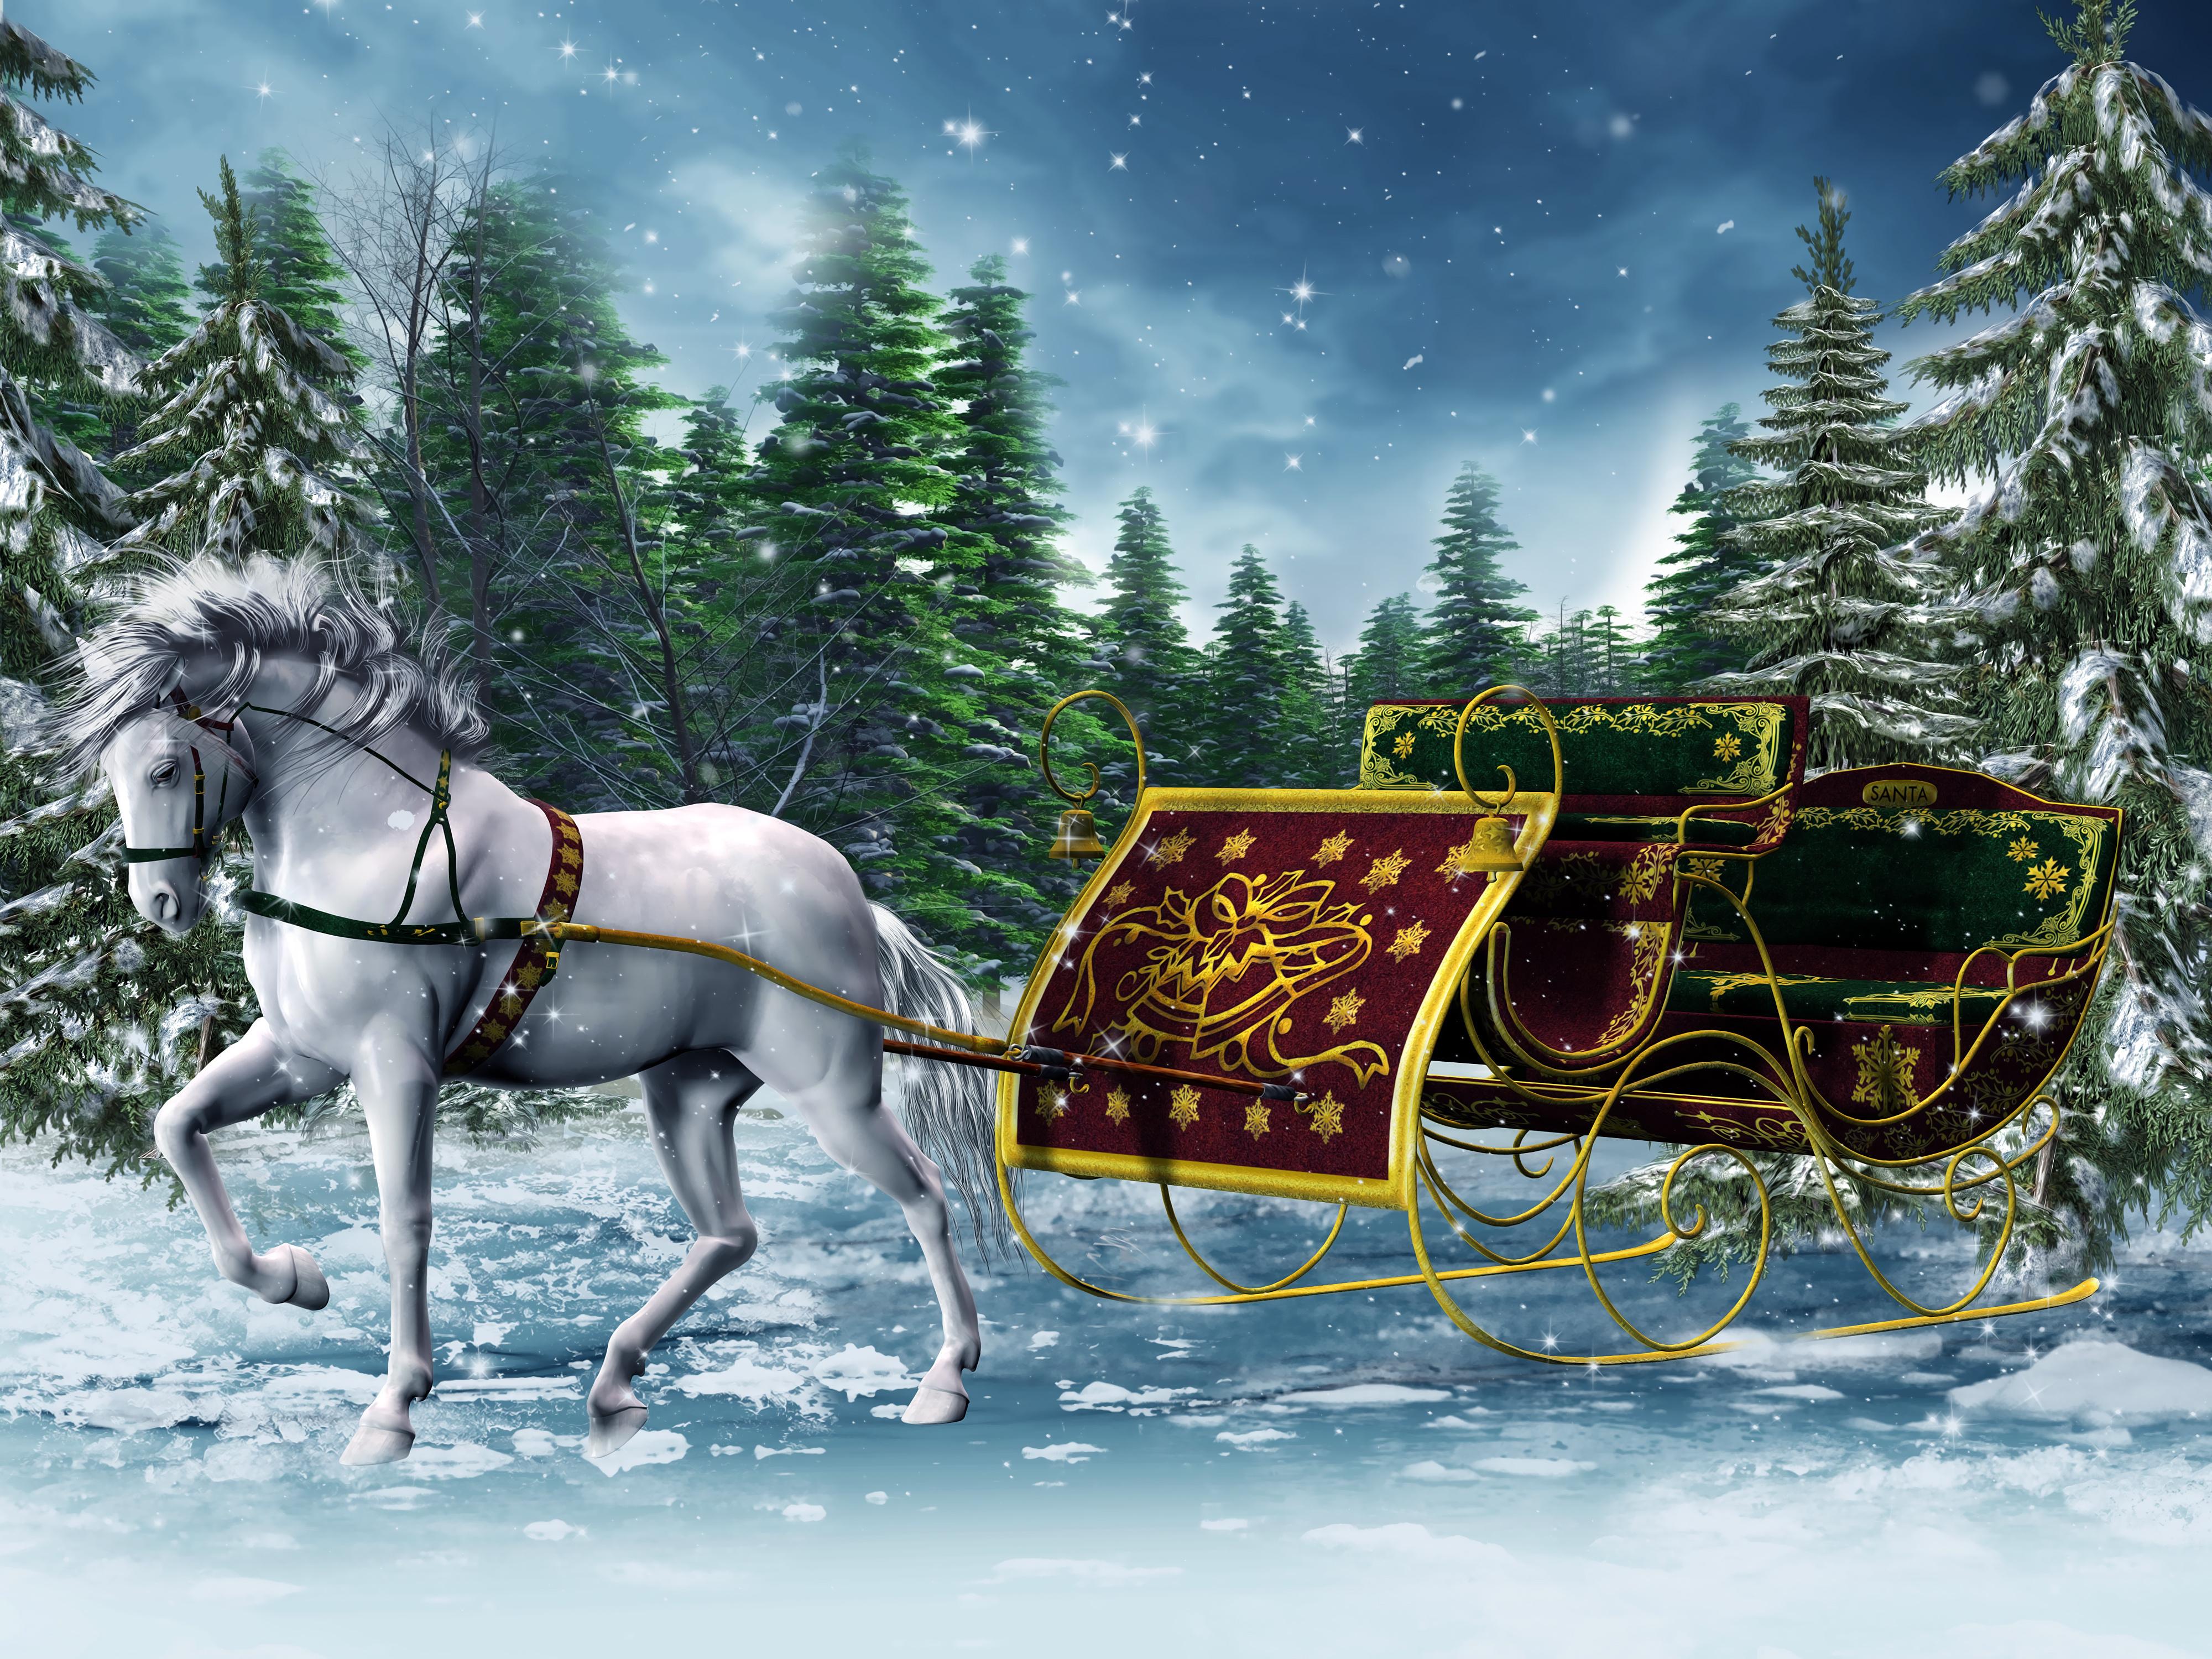 christmas sleigh horses 1920x1080 wallpaper - photo #5